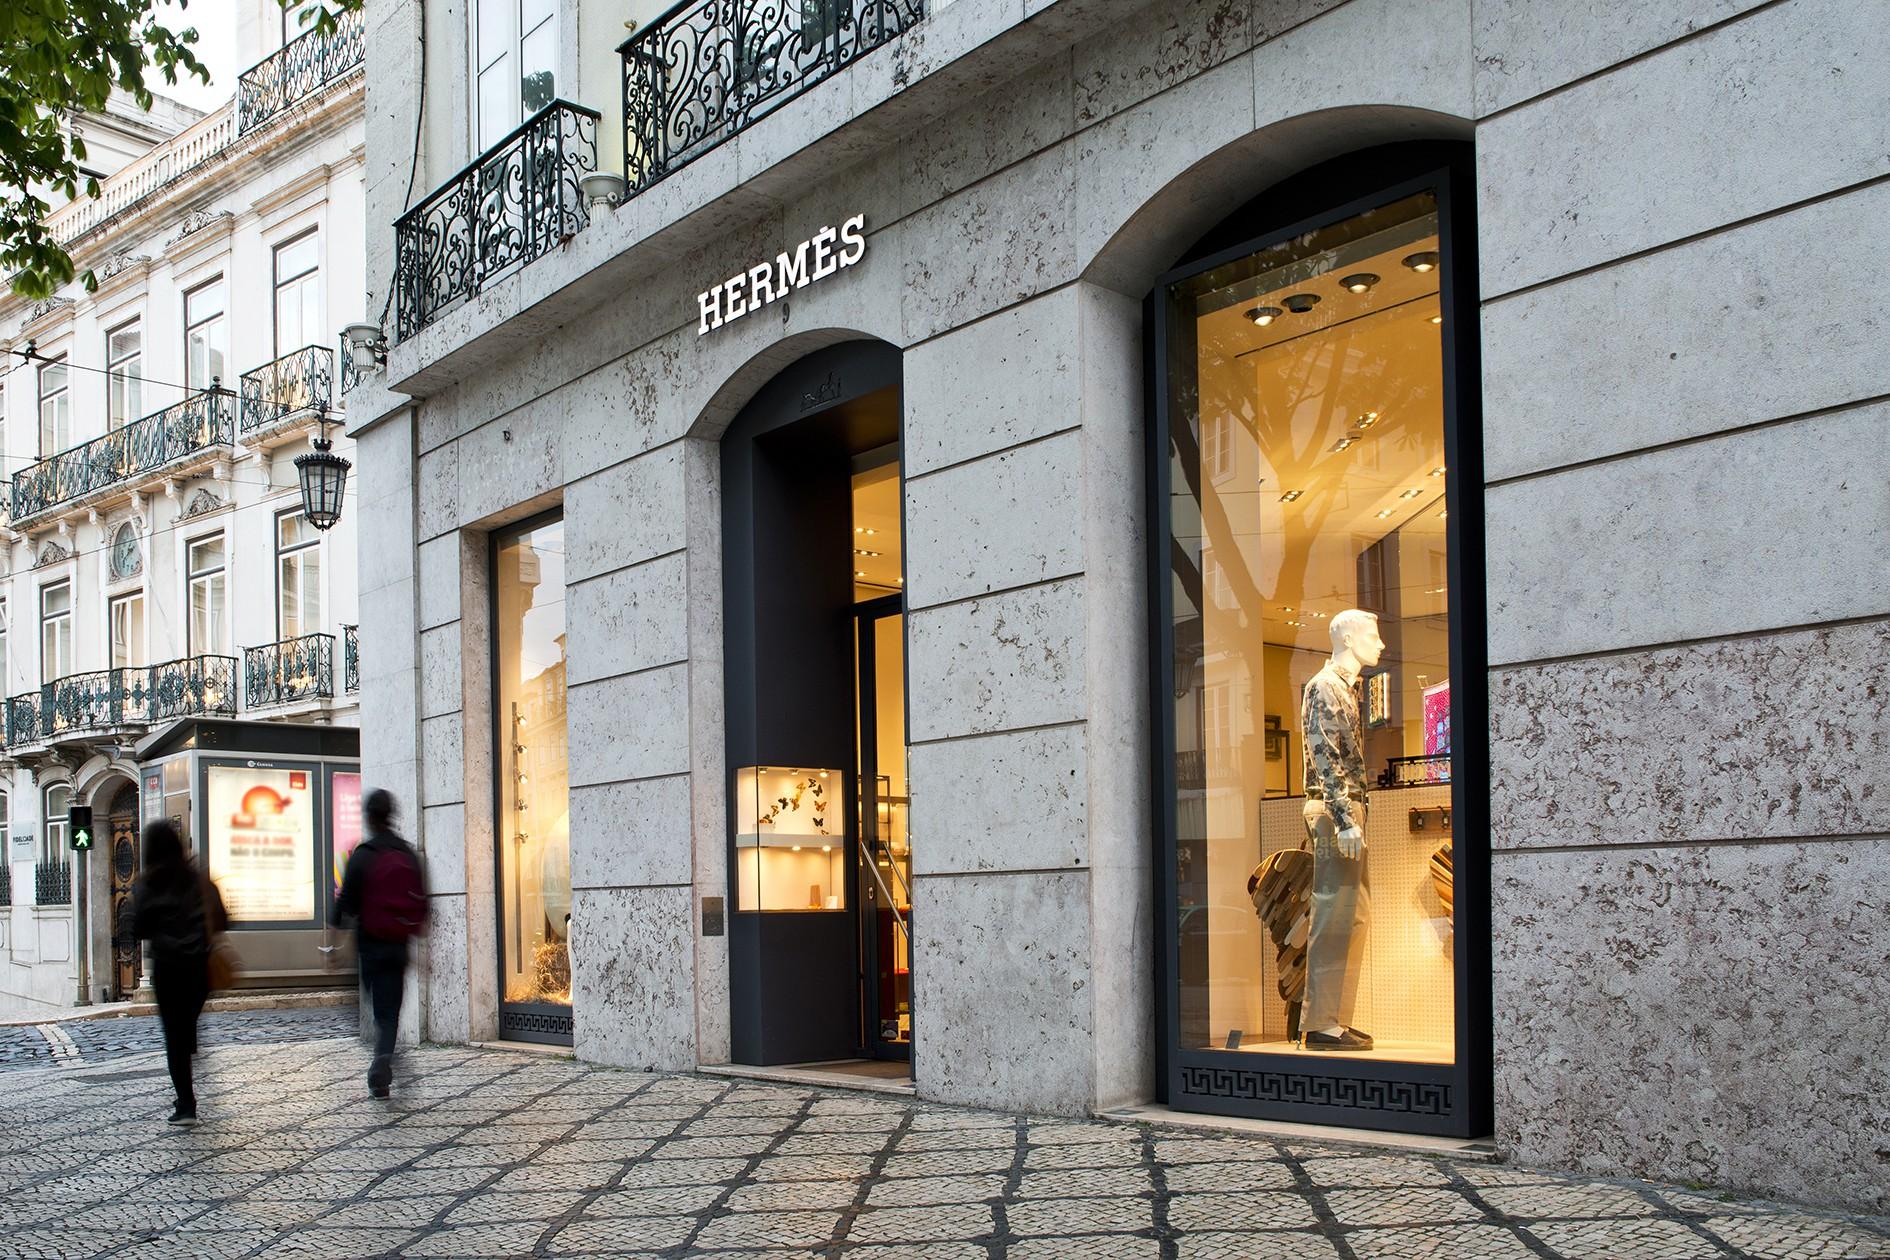 a958f9cff8f Comércio de luxo junta em Lisboa CEO de marcas de topo